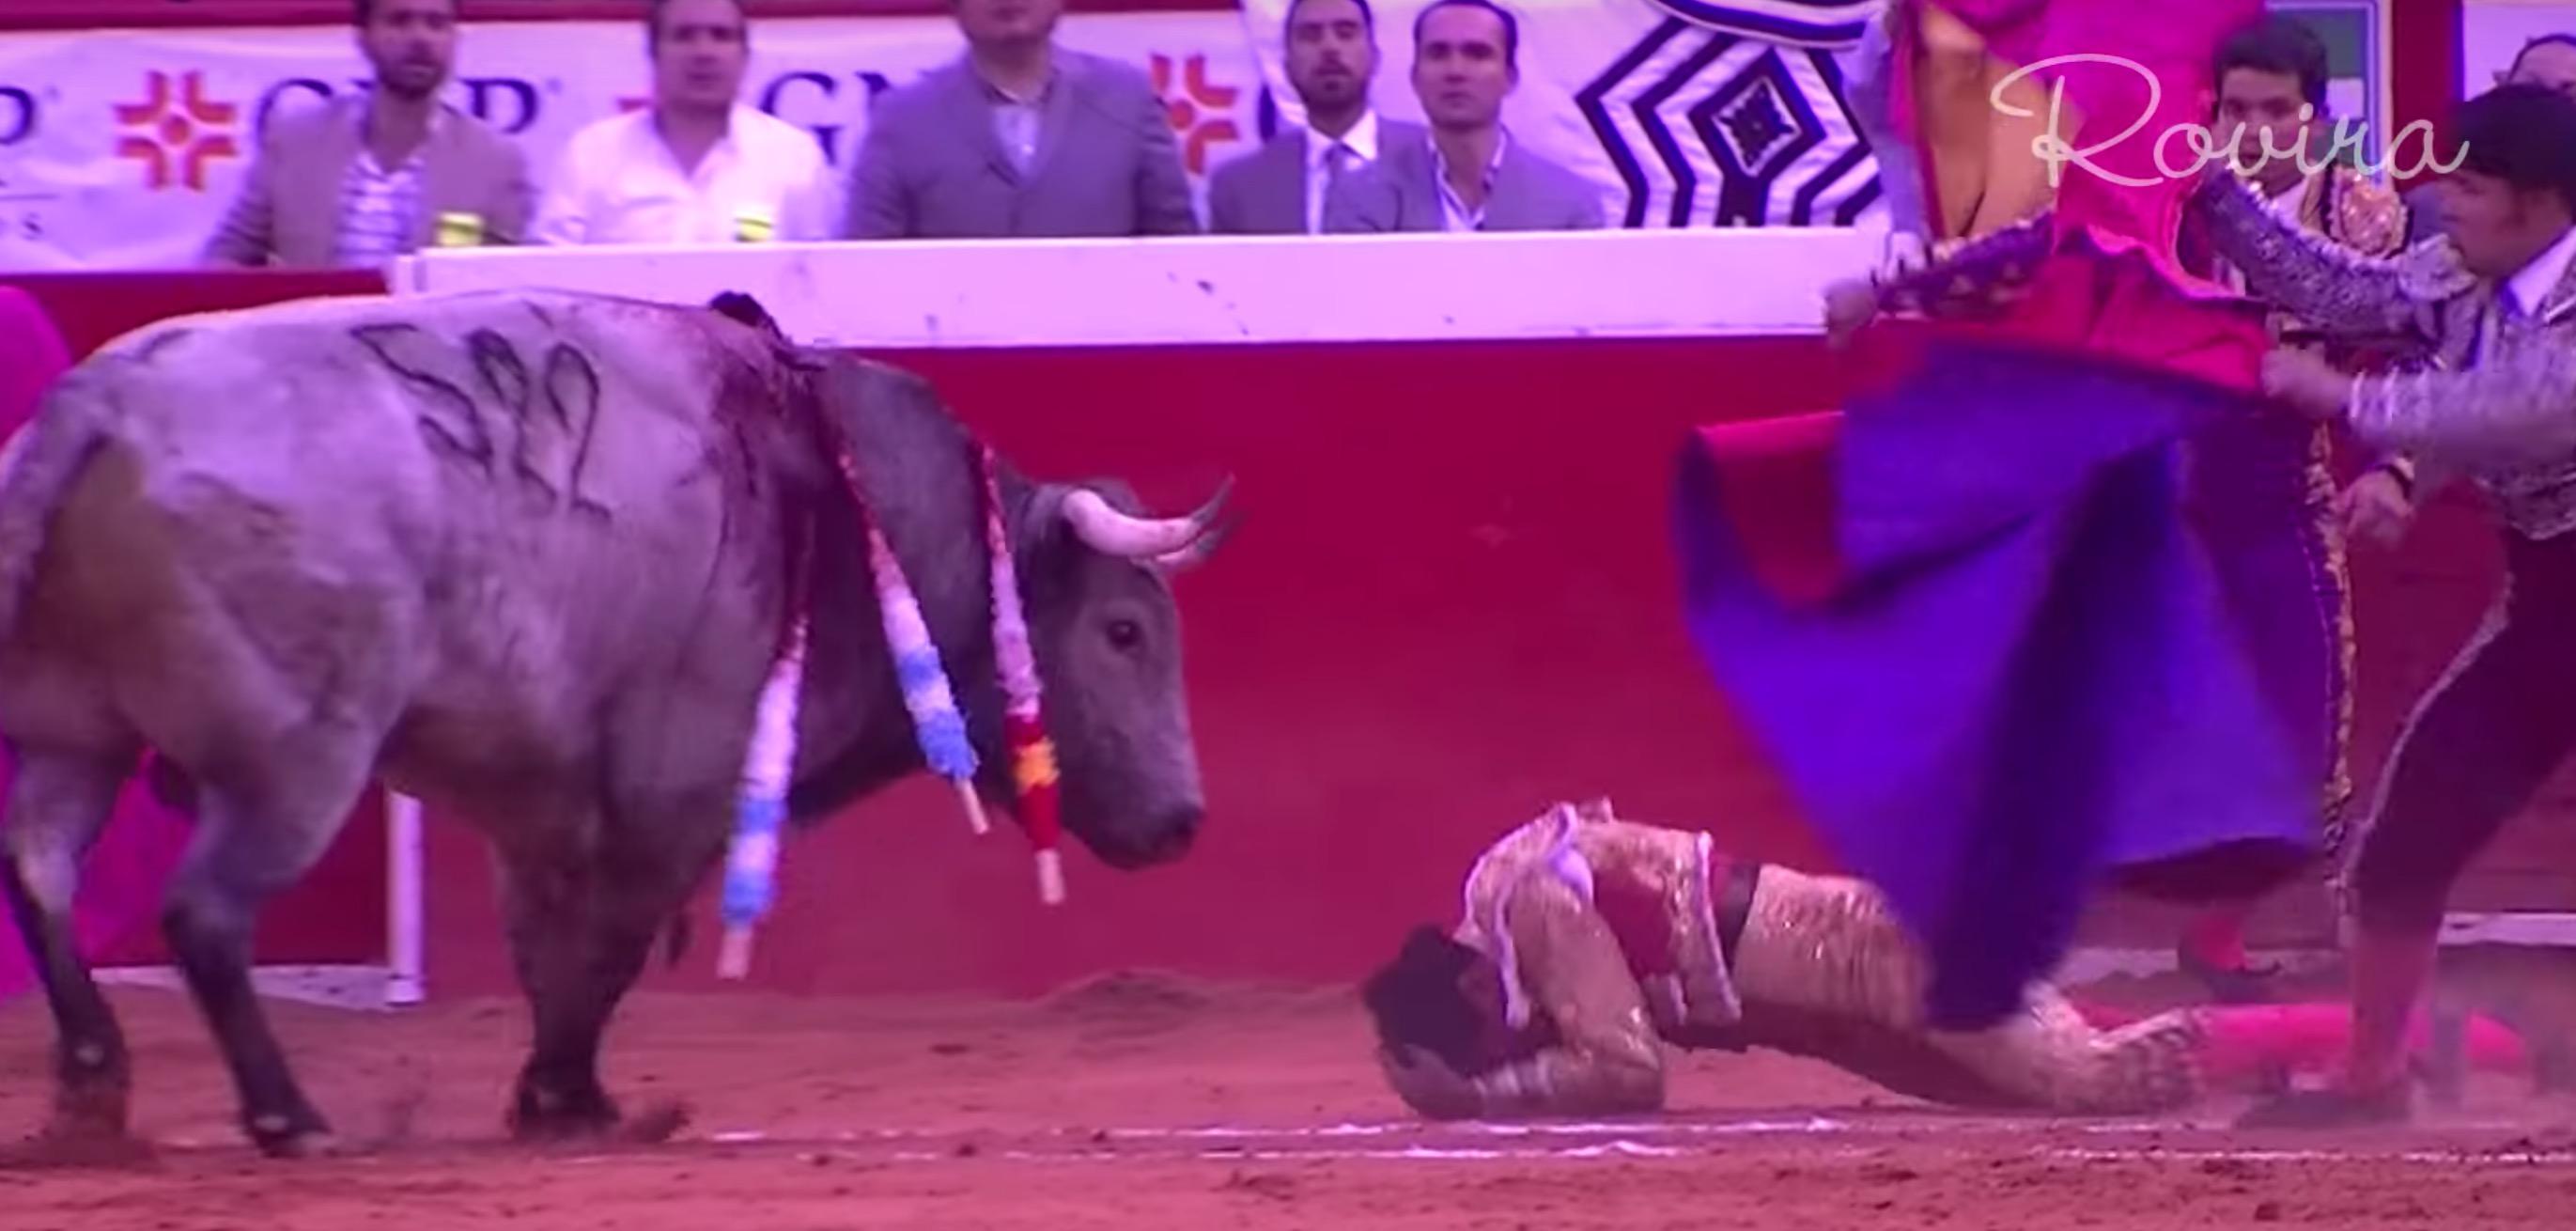 antonio-romero-torero-mexique-accident-9